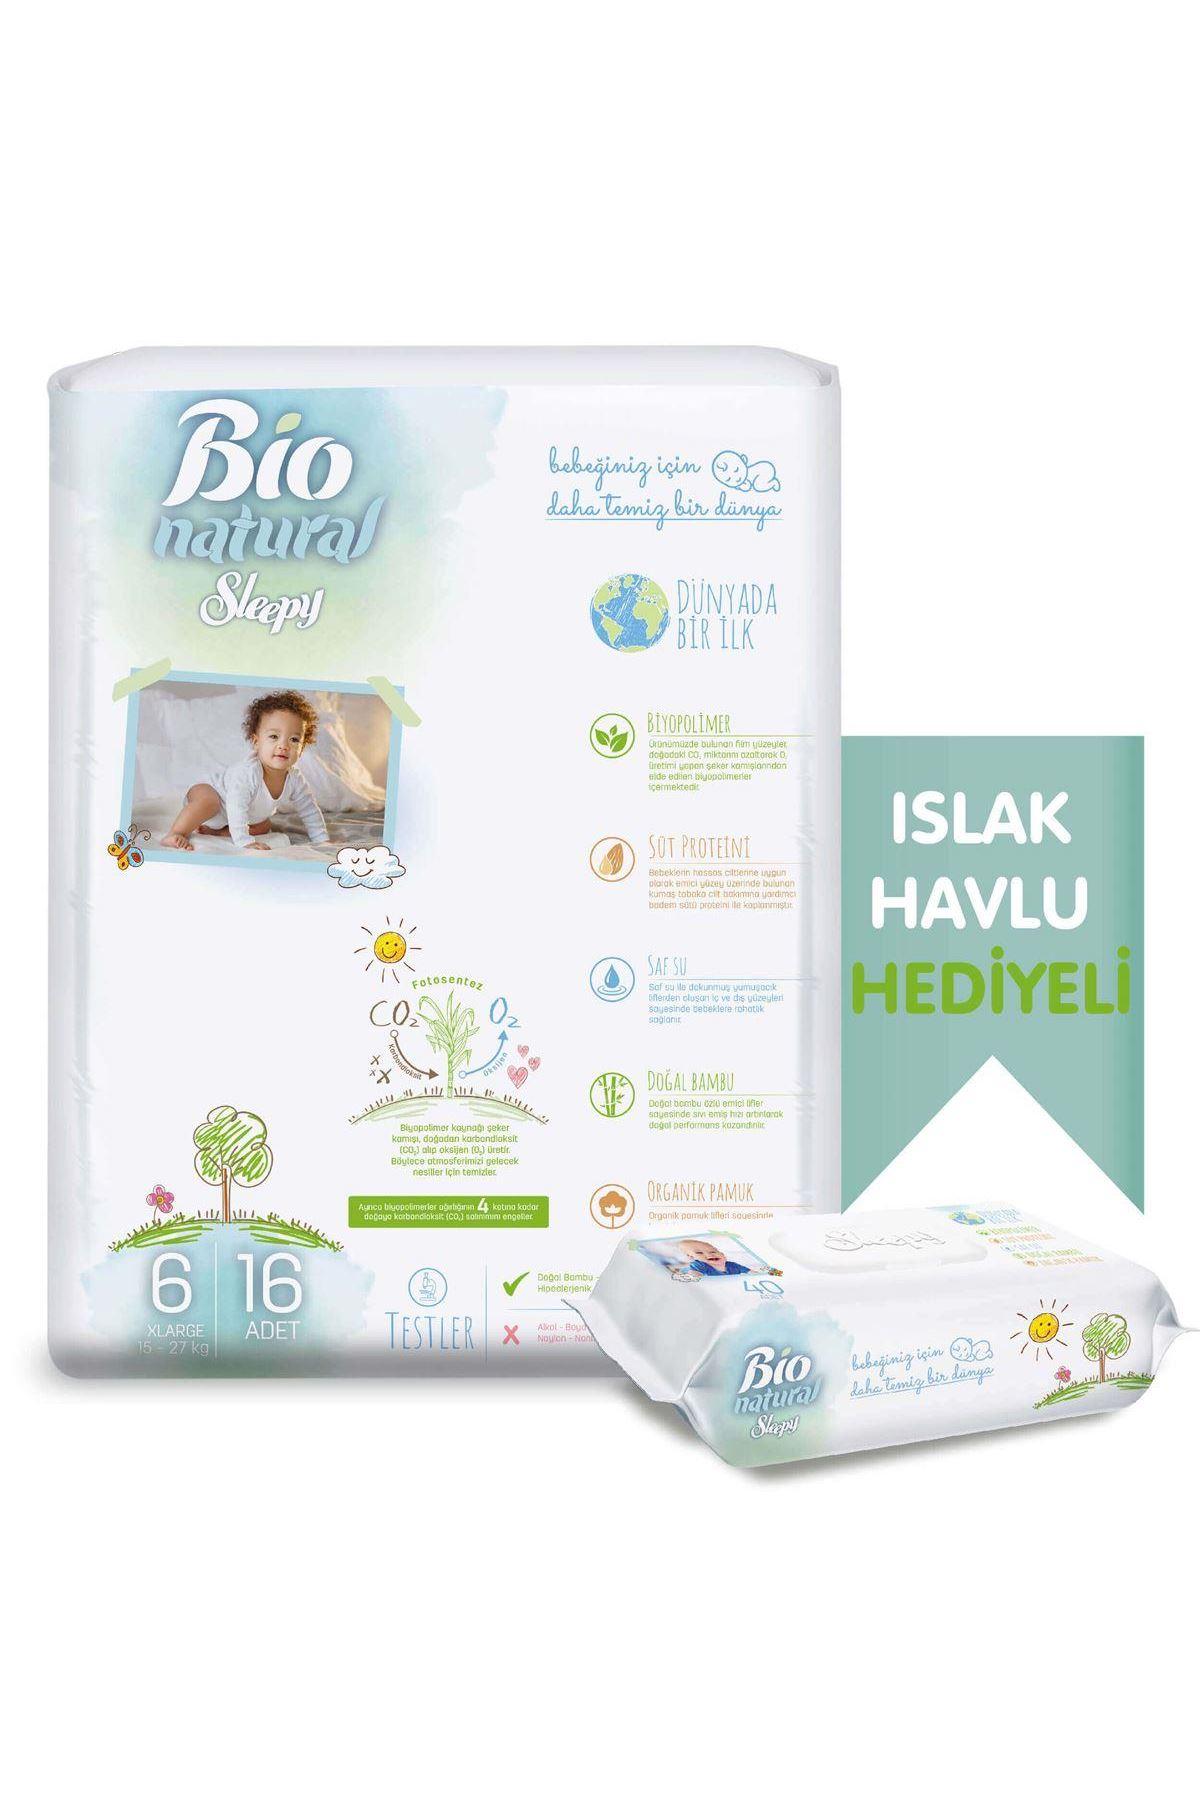 Sleepy Bio Naturel Bebek Bezi Jumbo 6 Beden 15-27 Kg 16 Adet (Islak Havlu Hediyeli)